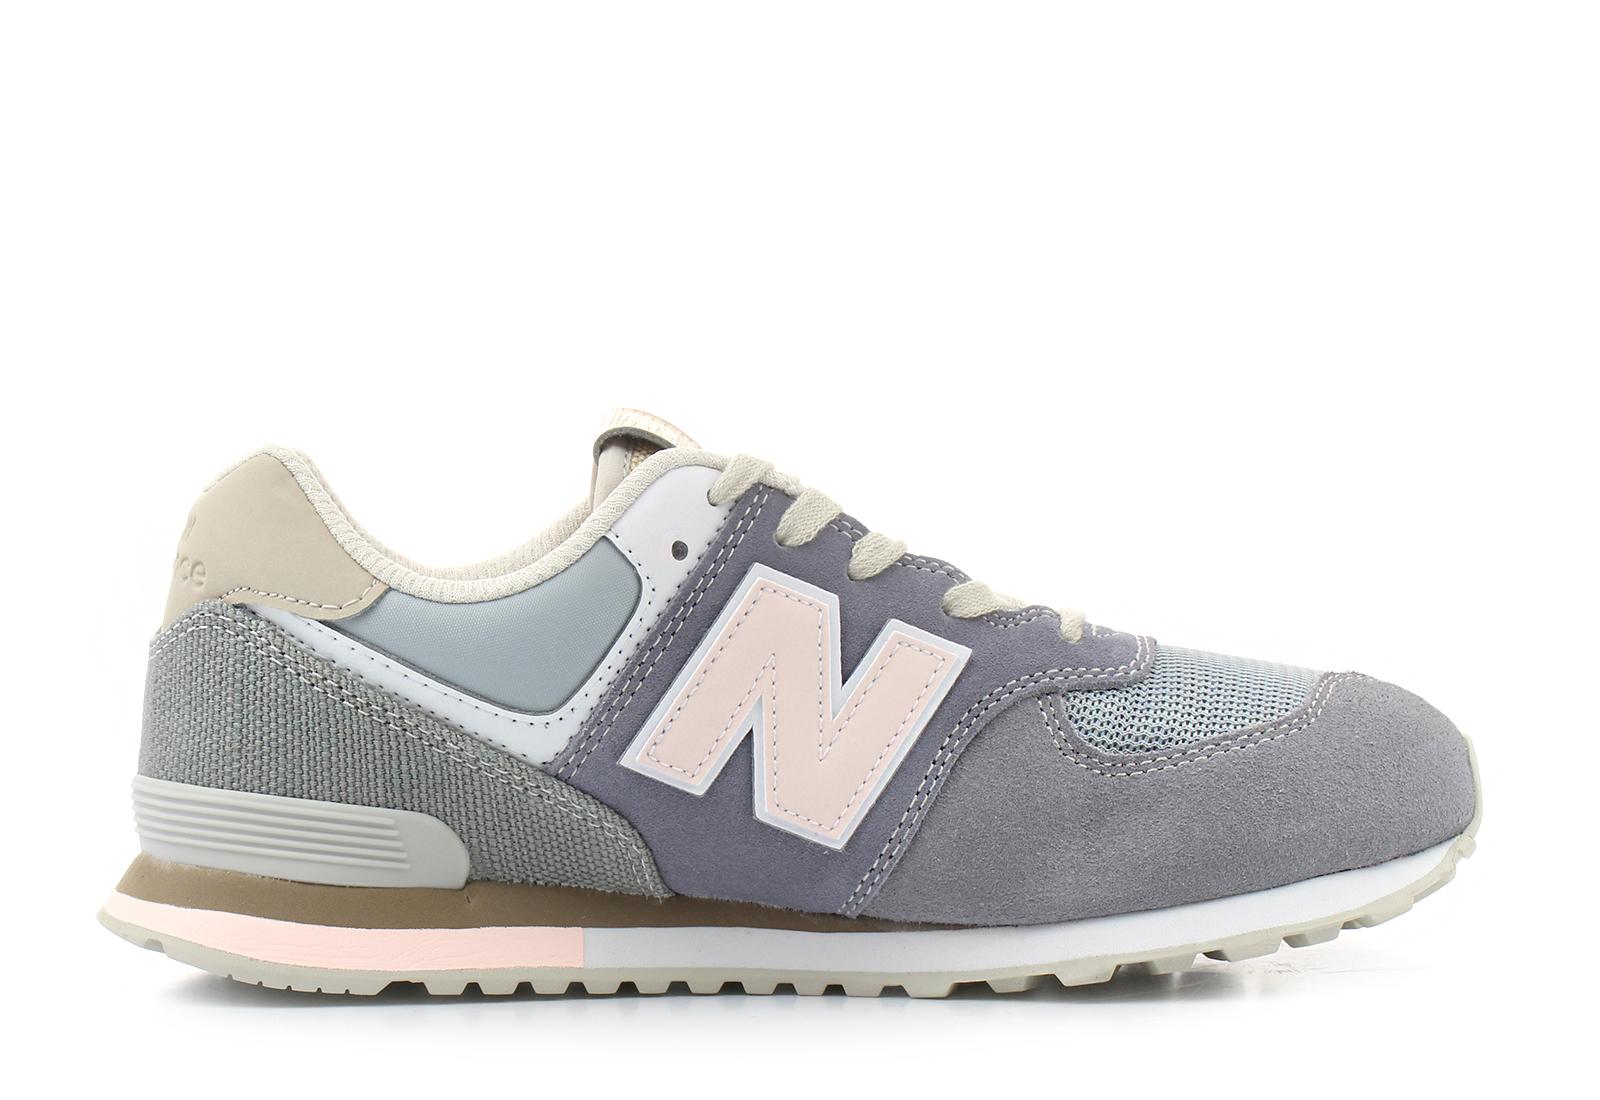 Balance Shoes Online New GC574SG shop Gc574 sneakers for Hv8qqBw